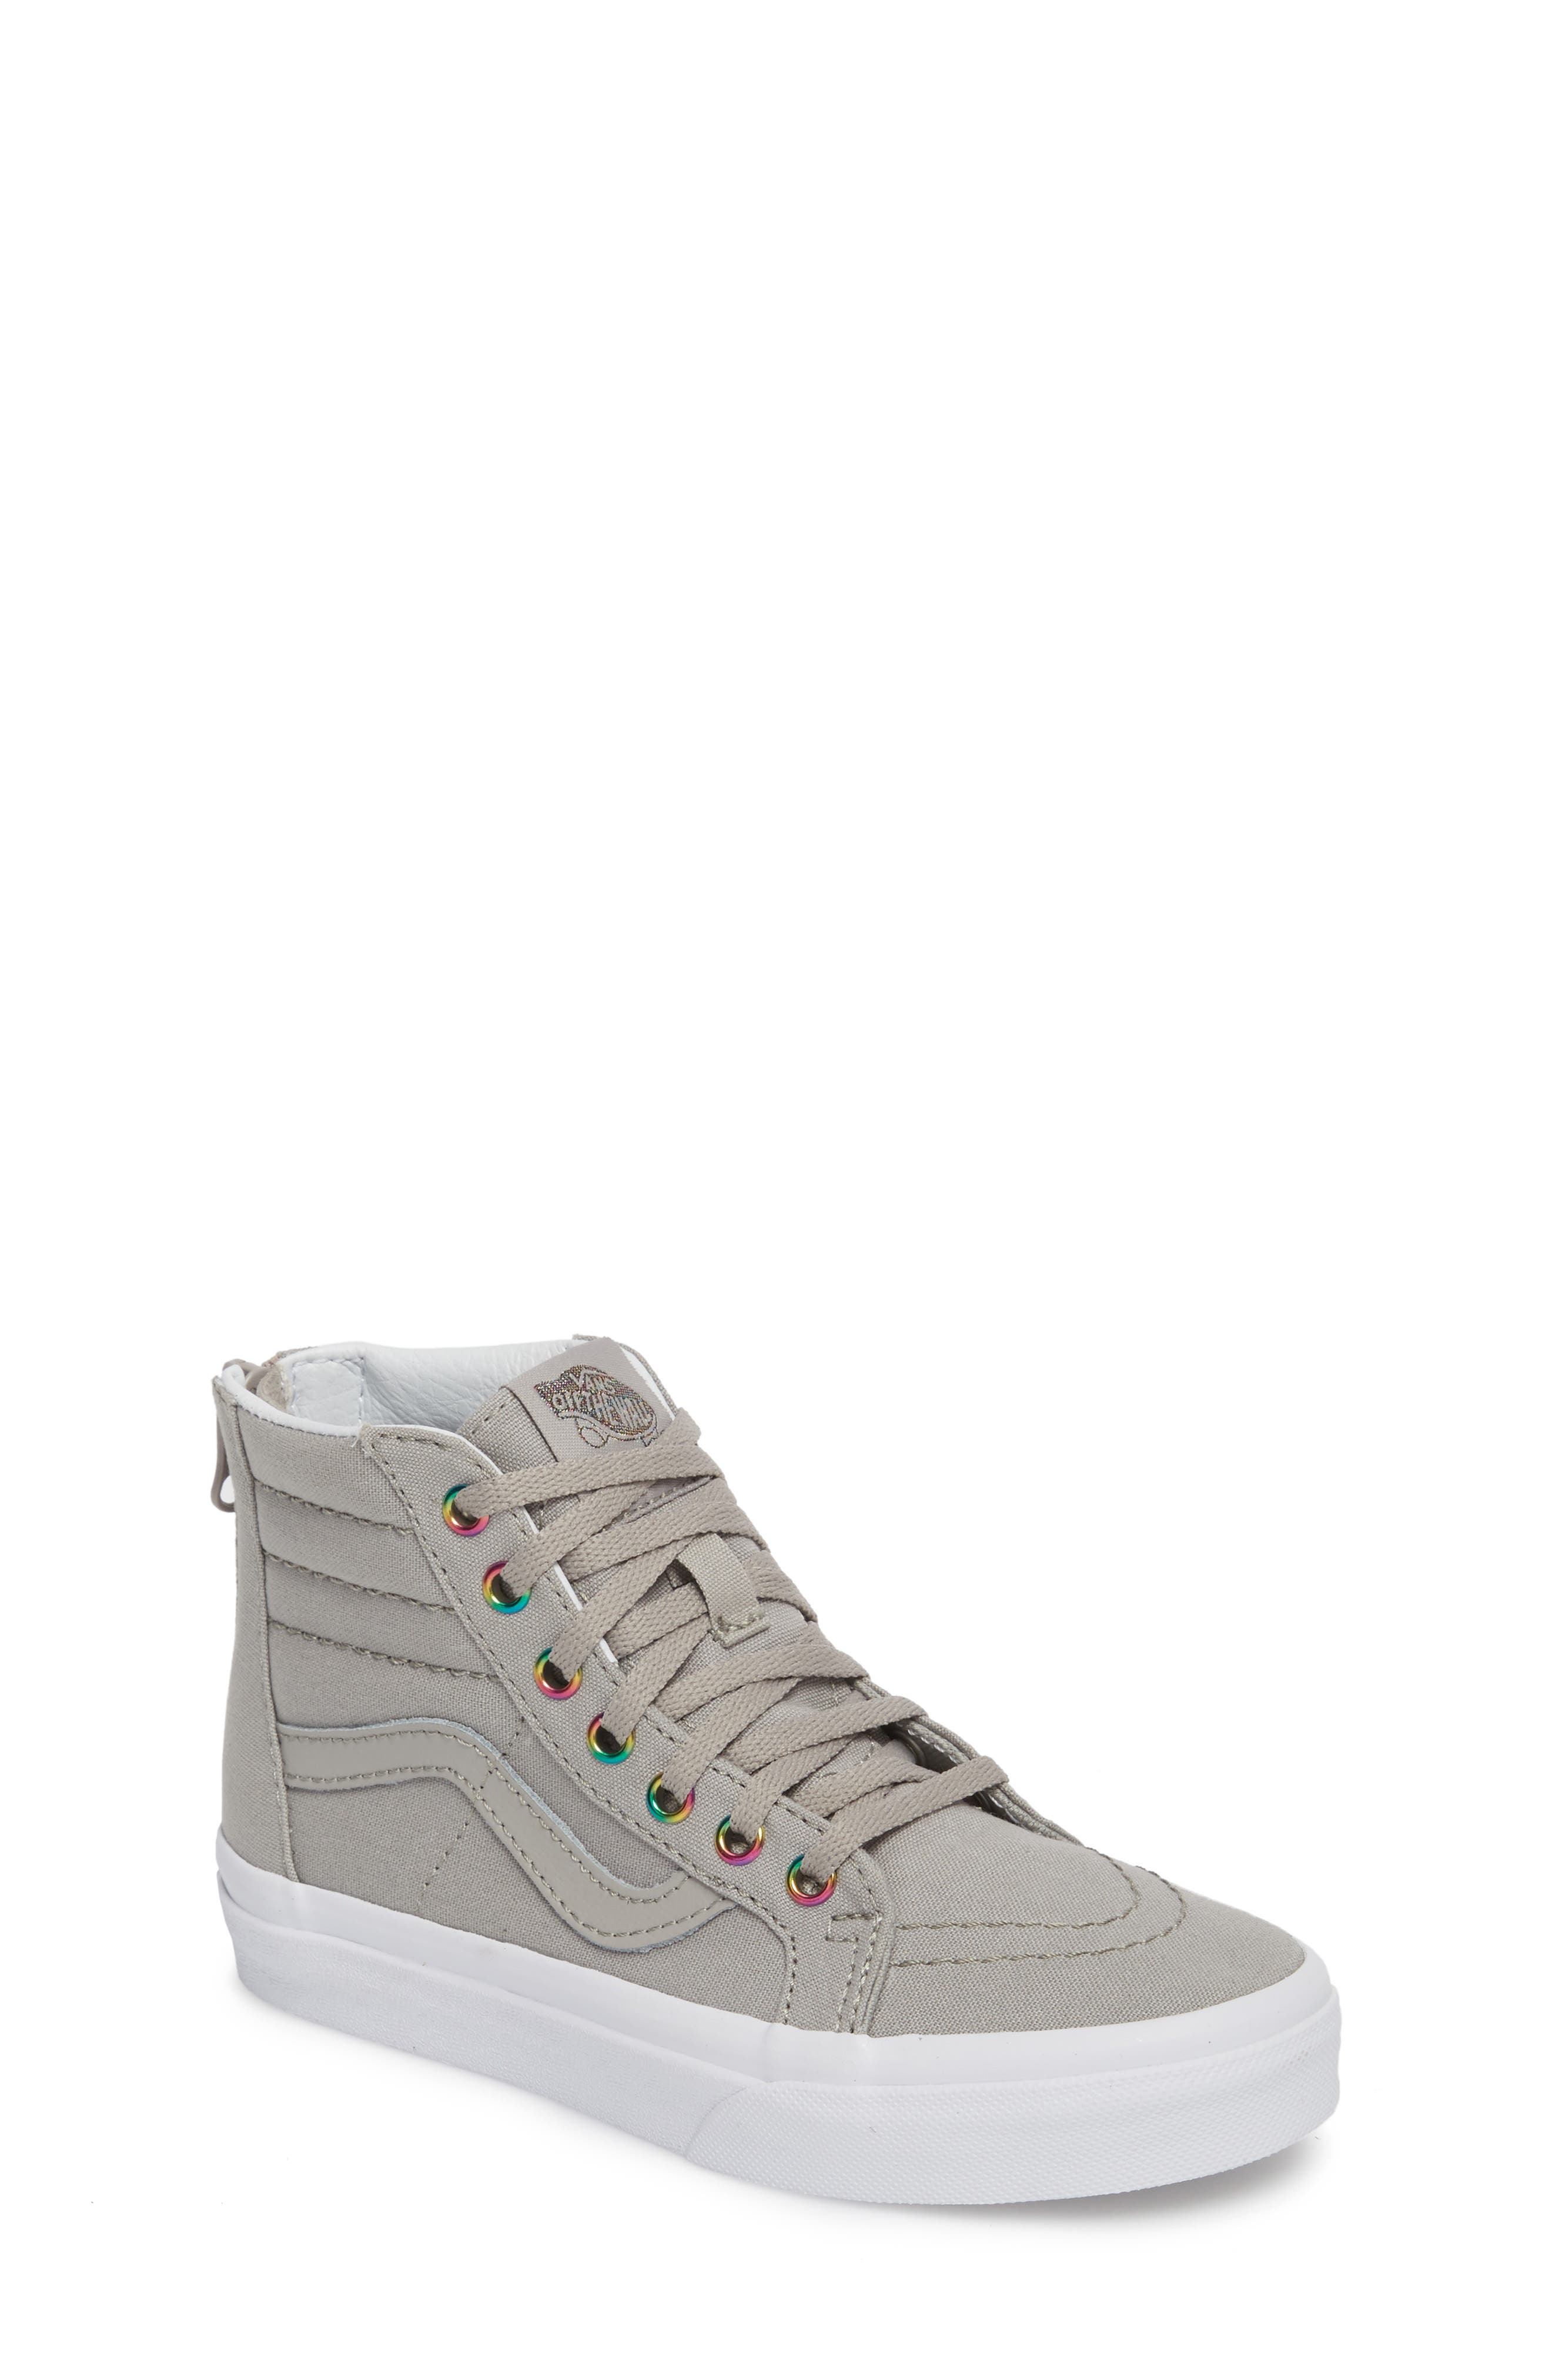 Sk8-Hi Zip High Top Sneaker,                             Main thumbnail 1, color,                             Rainbow Eyelet Drizzle